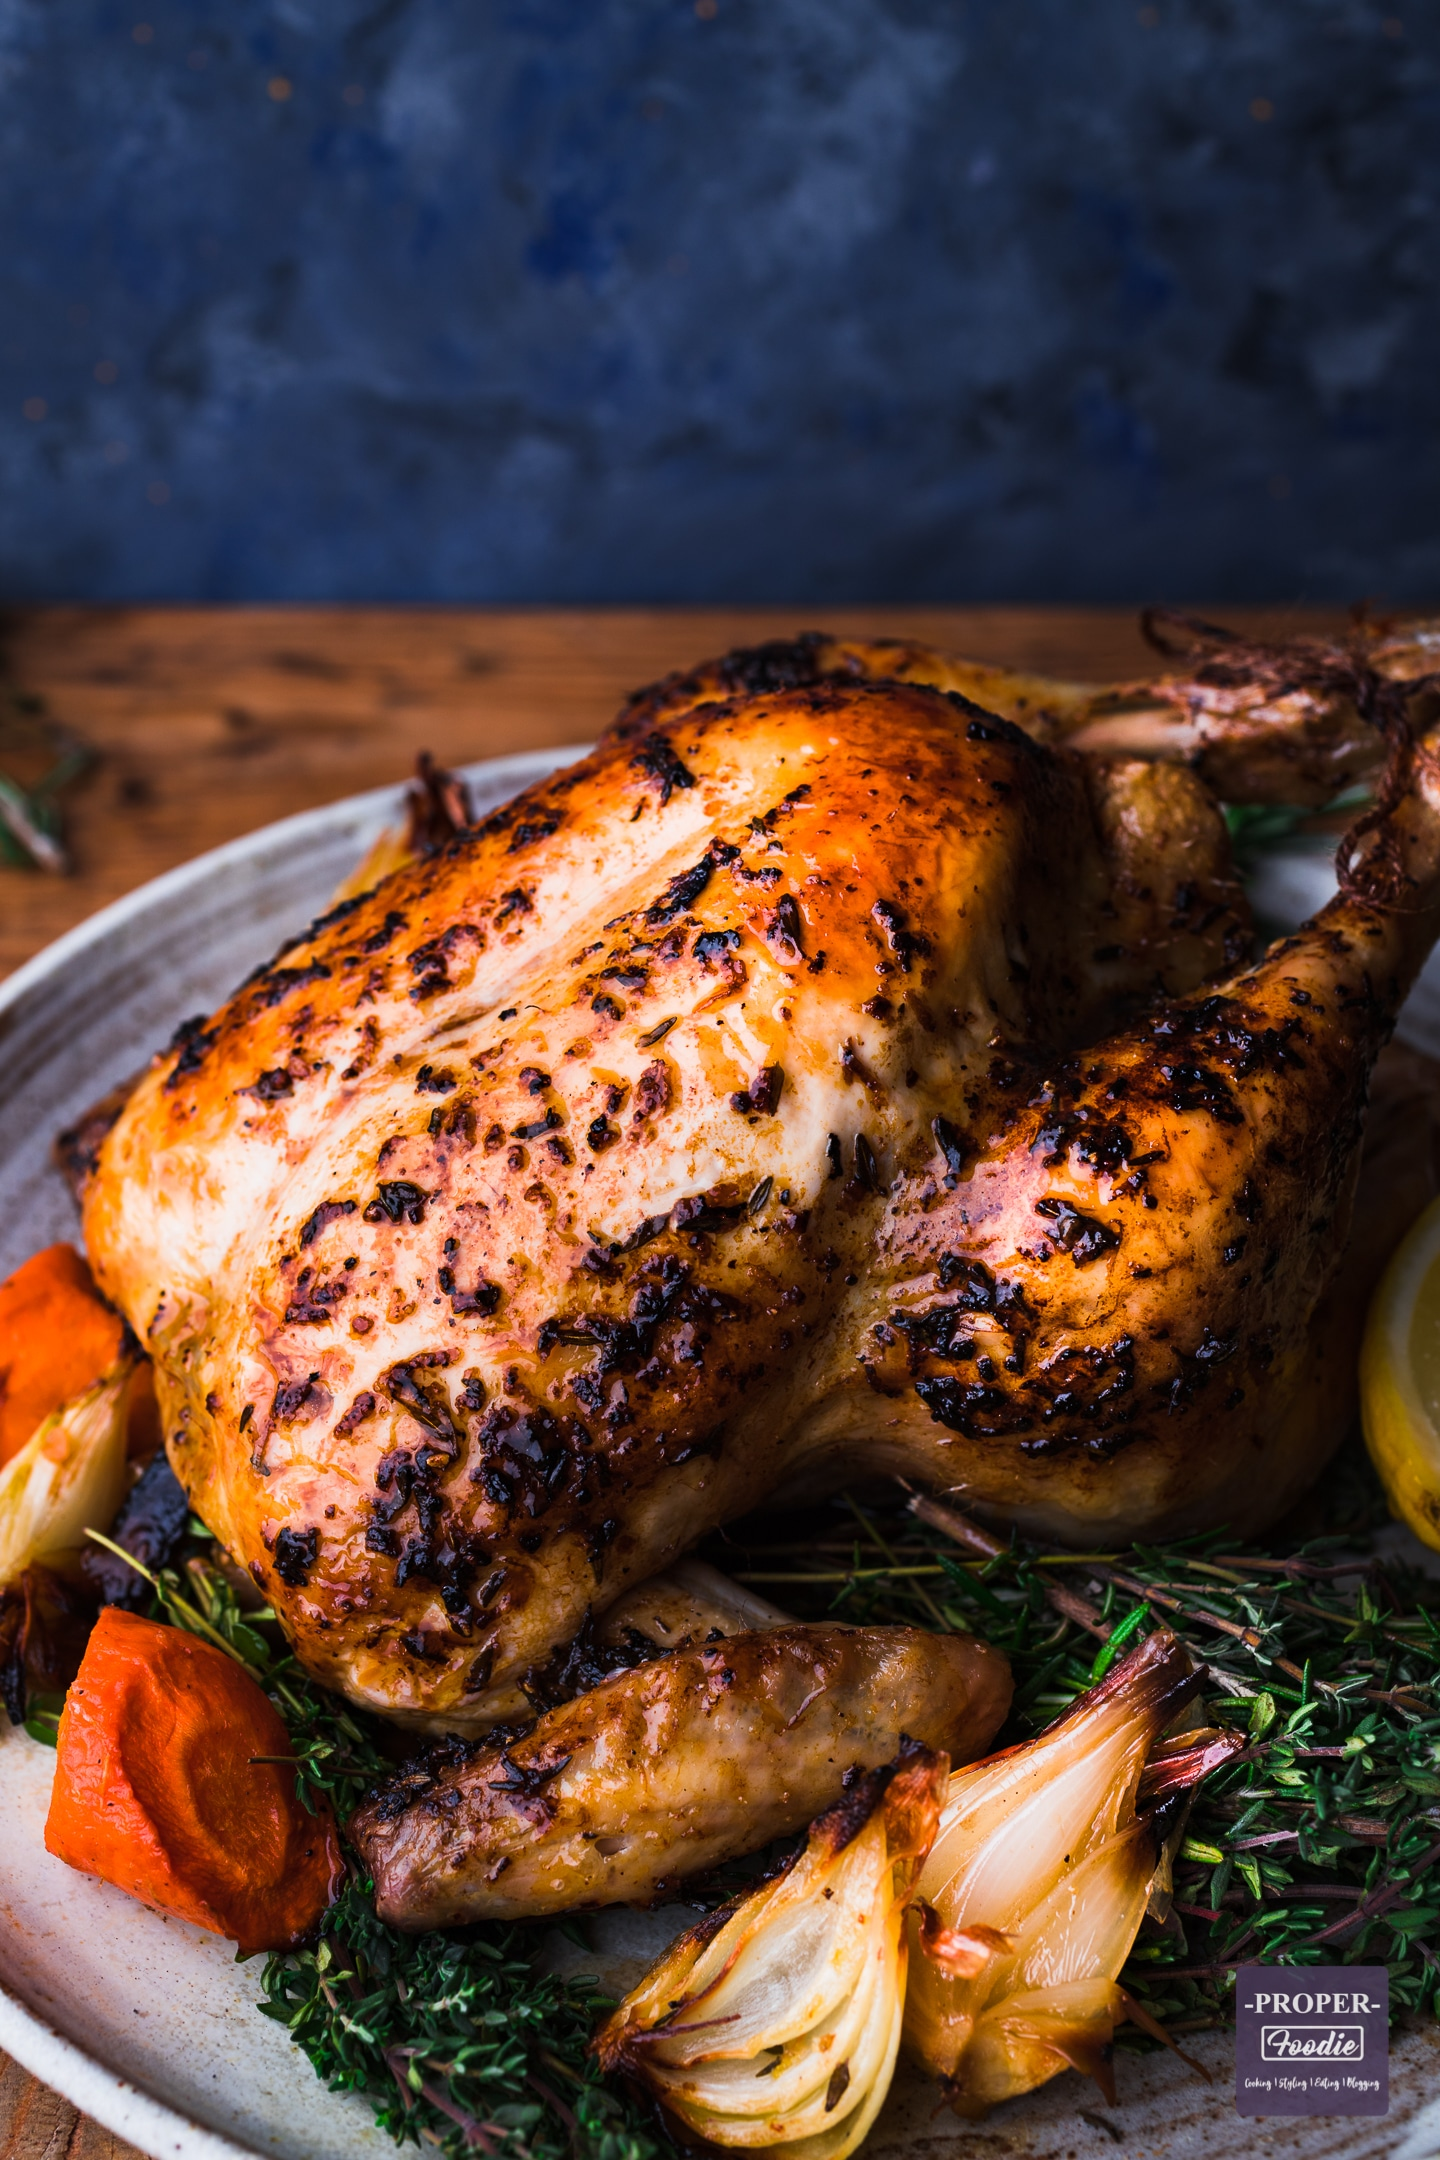 Roast chicken with lemon